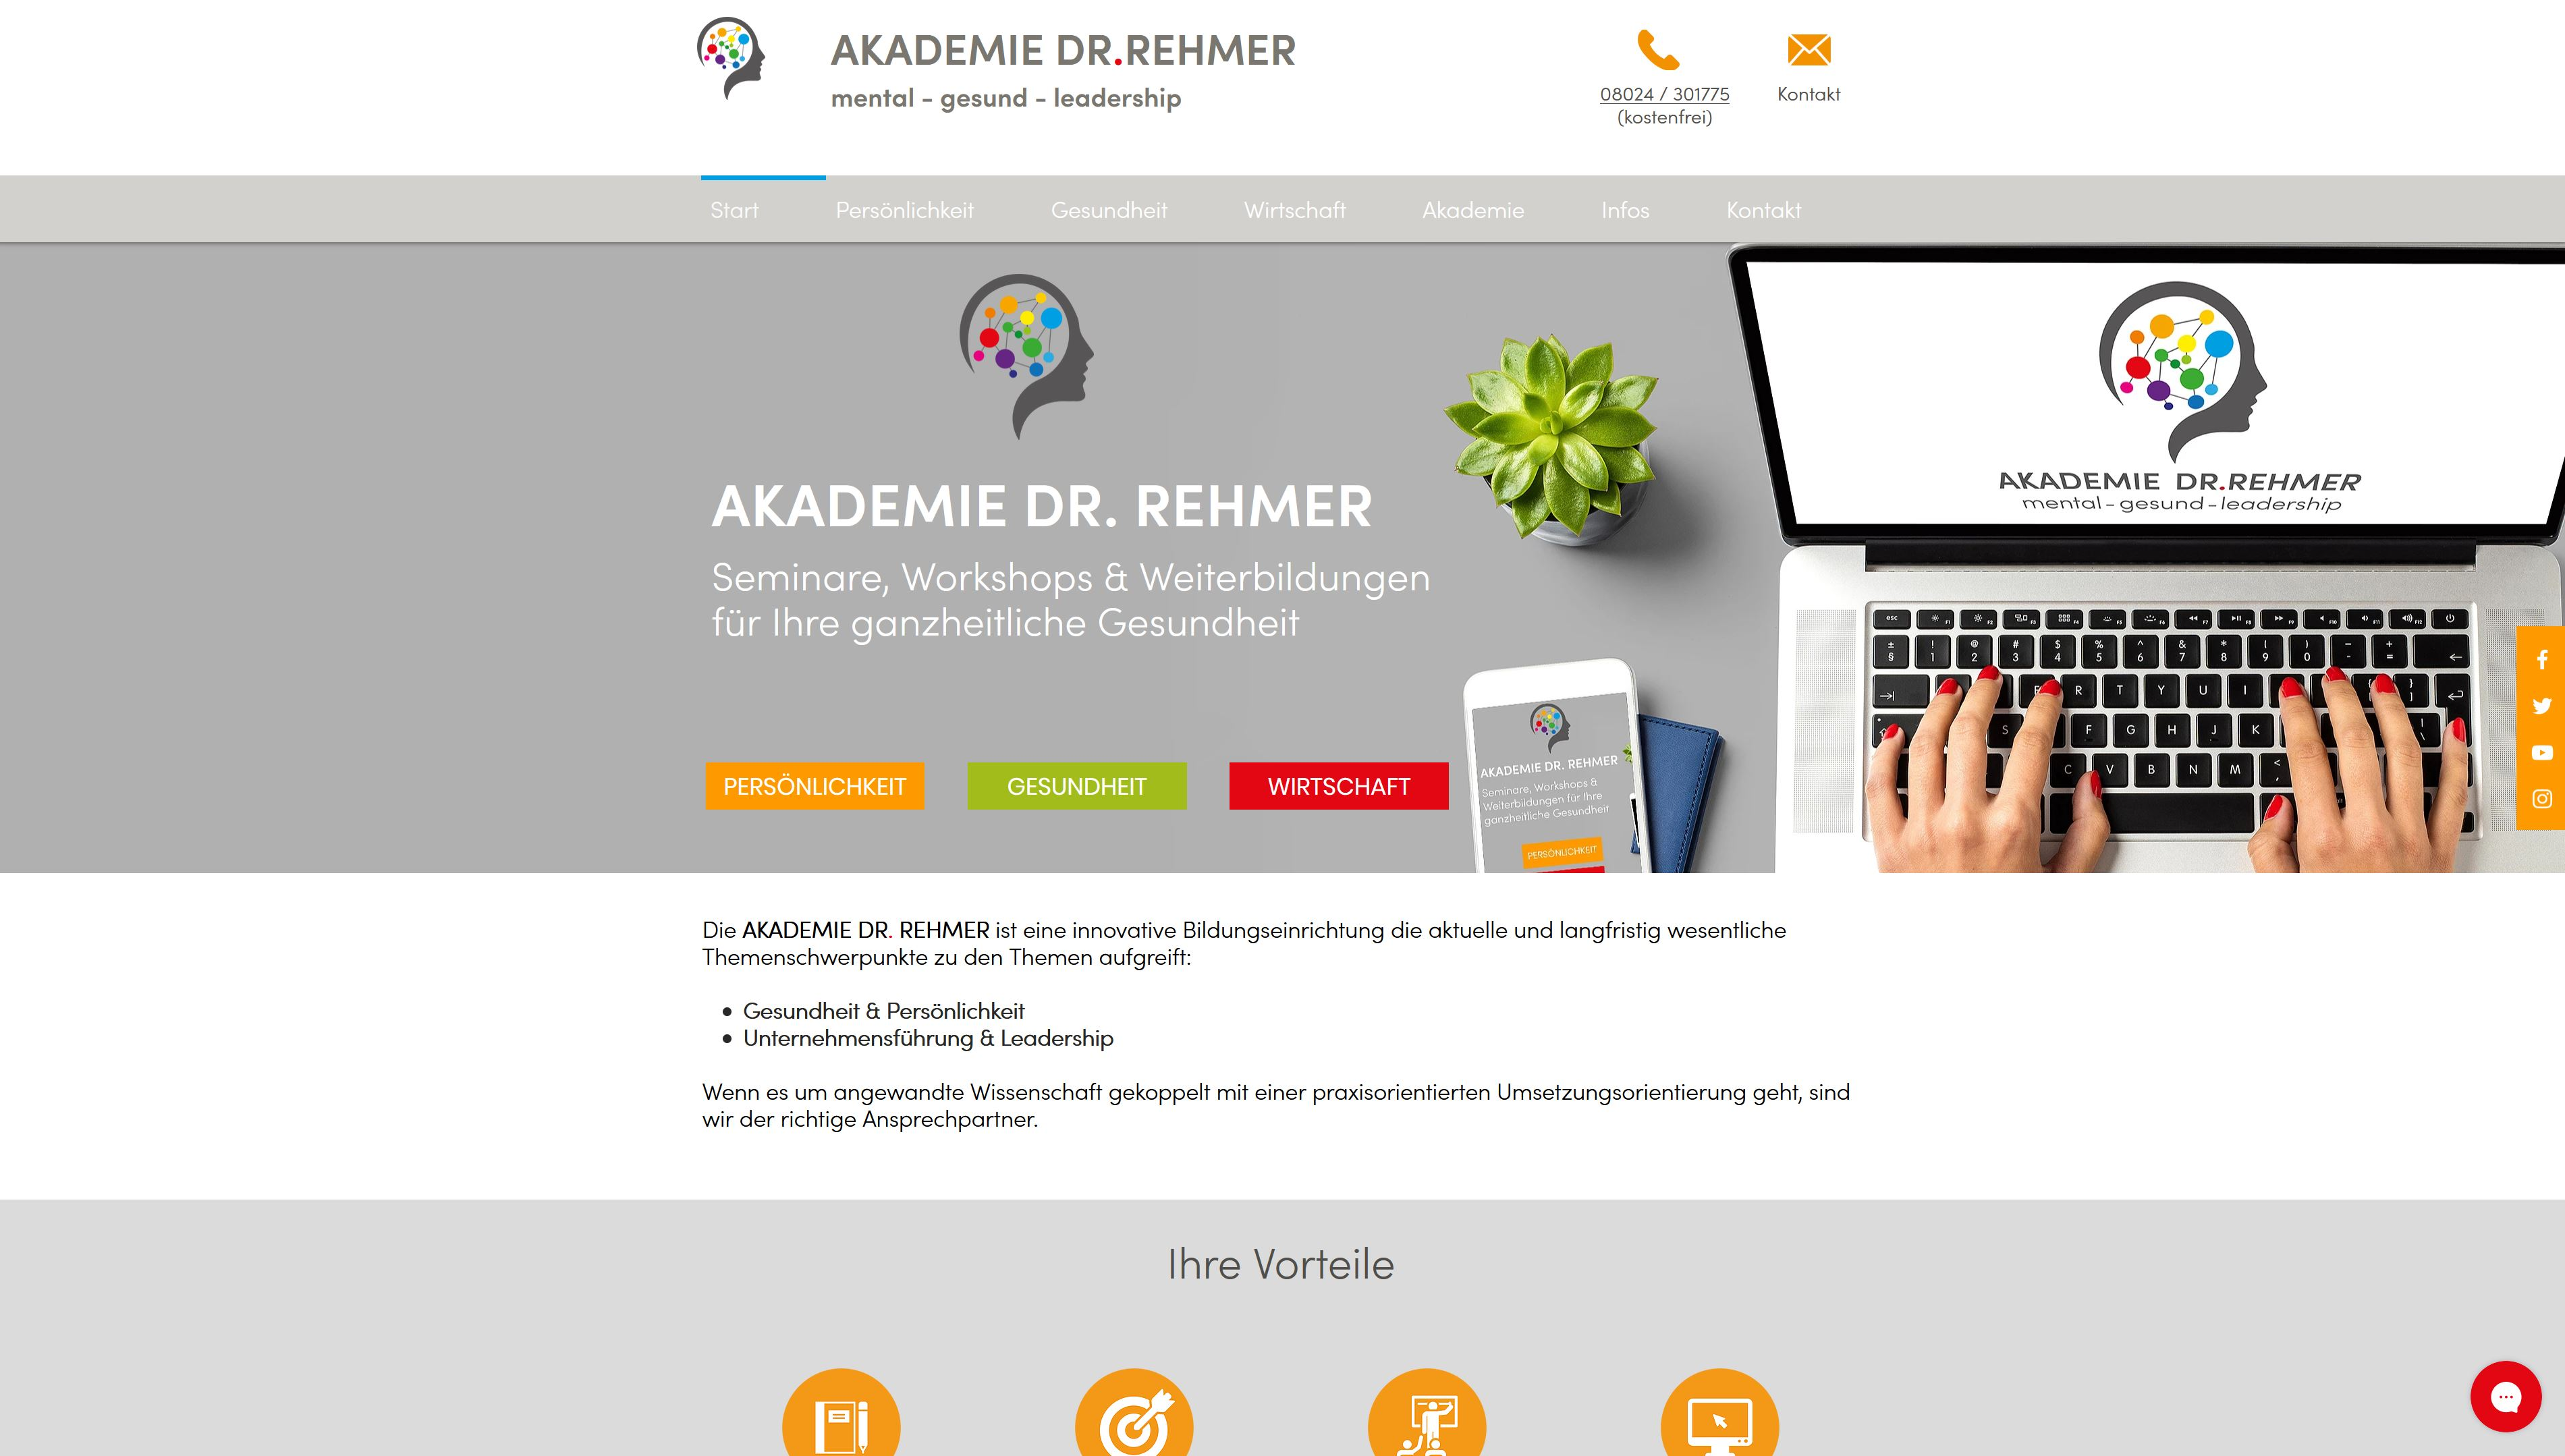 Akademie Dr Rehmer